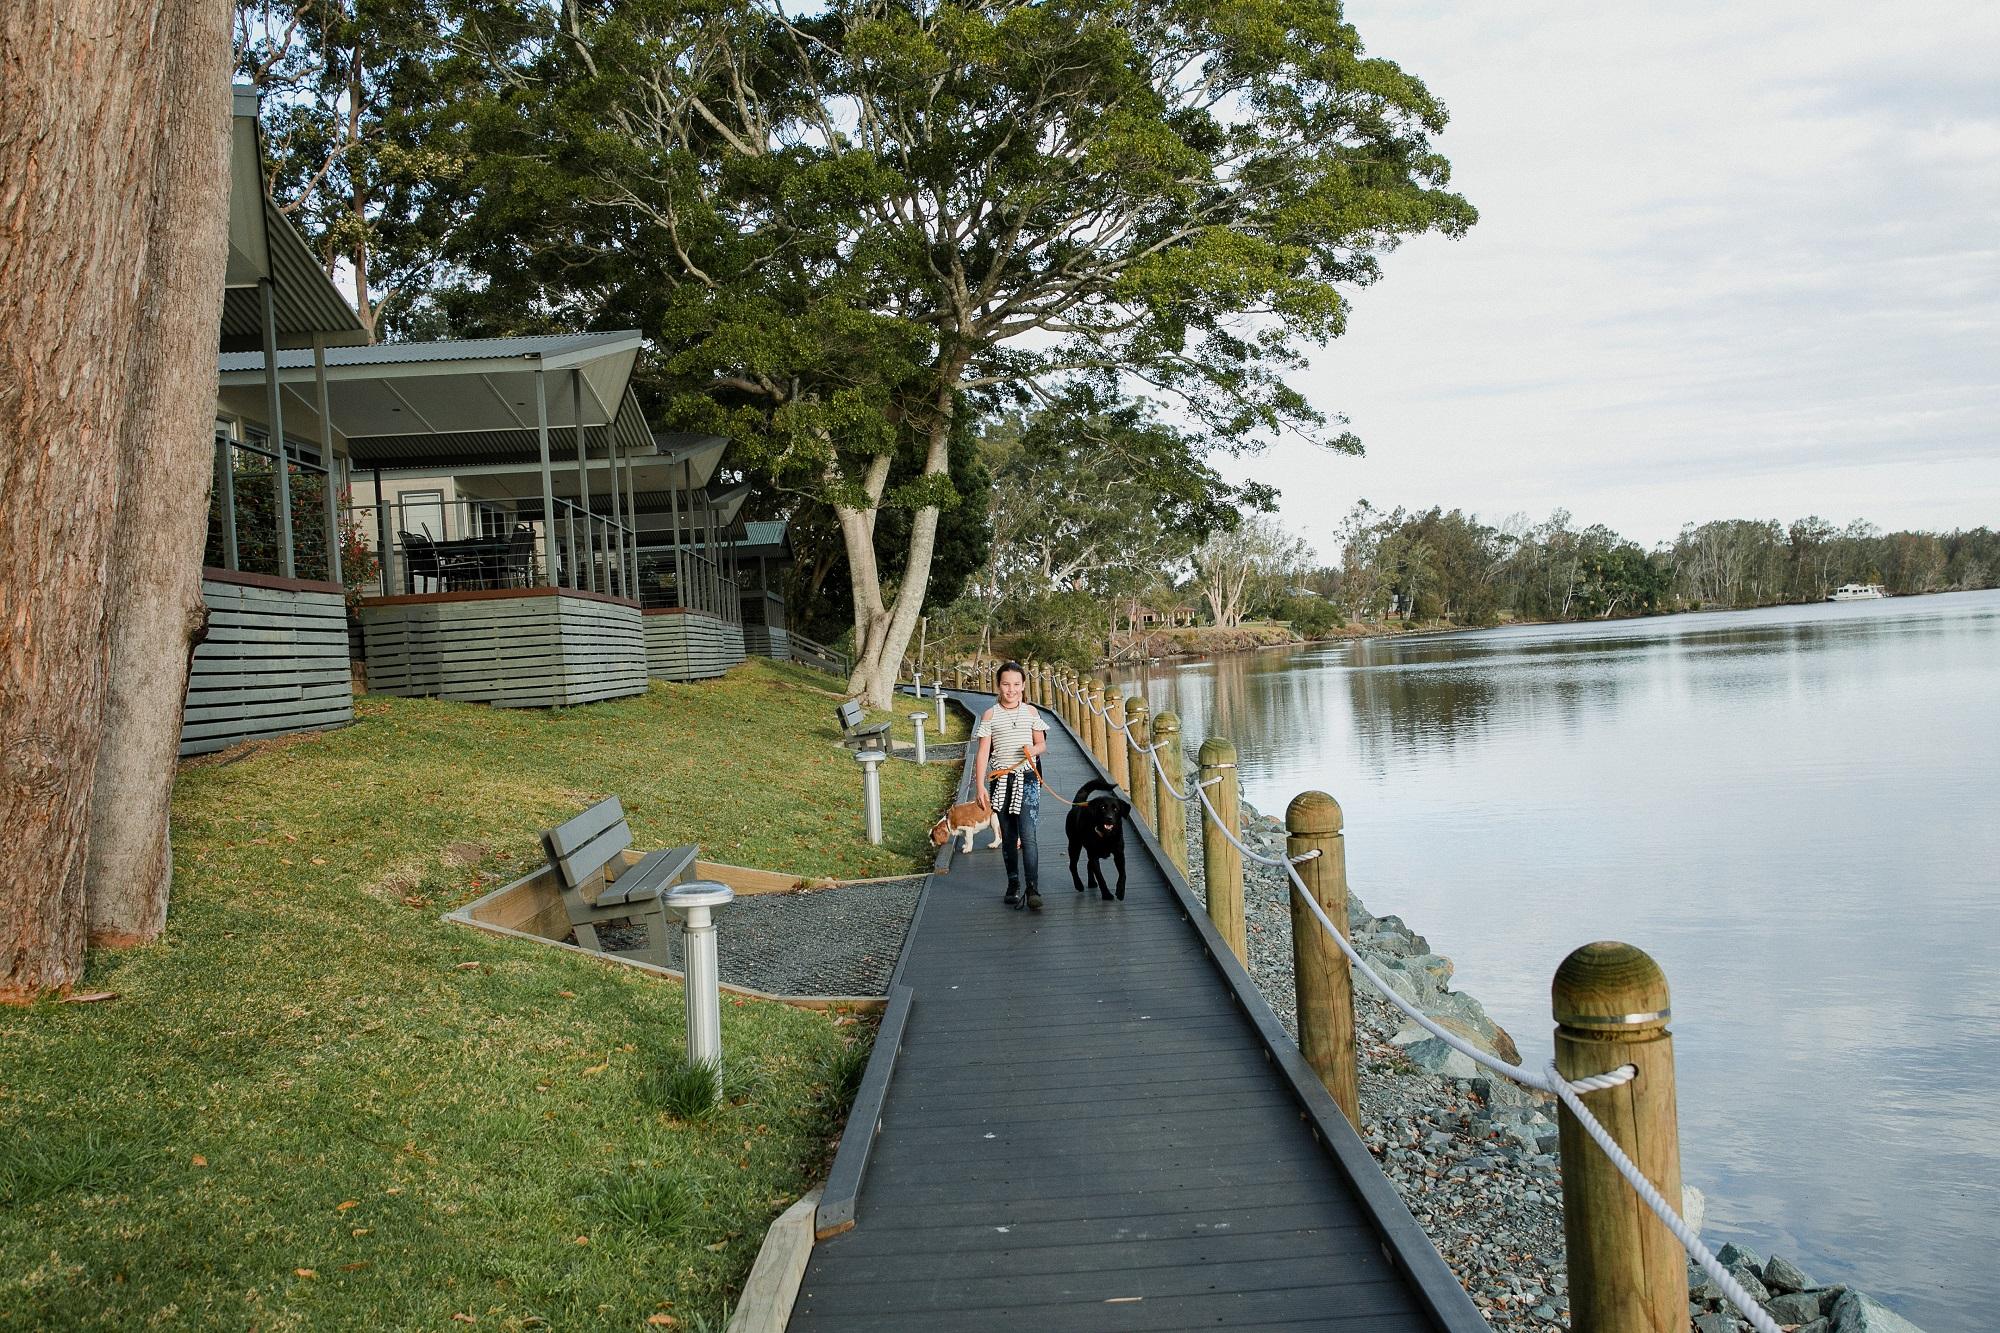 Forster Holiday & Caravan Park, Wallamba River, NSW